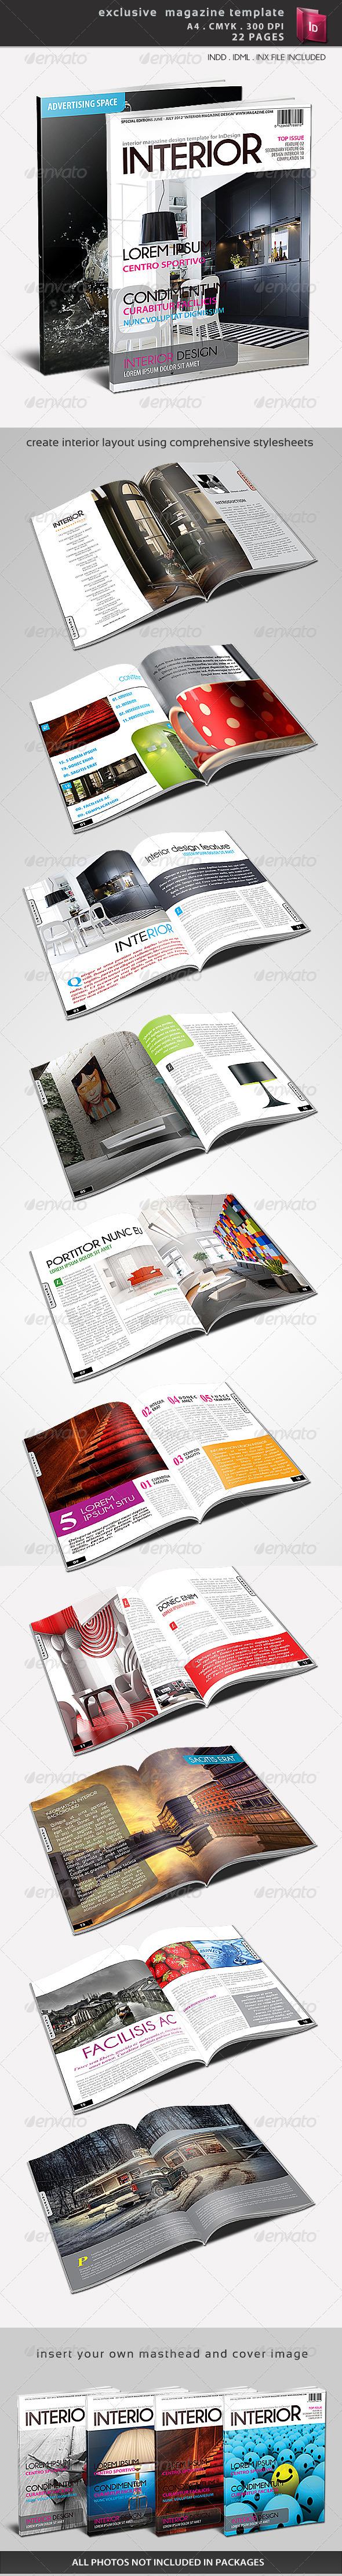 Exclusive Magazine Template - Magazines Print Templates